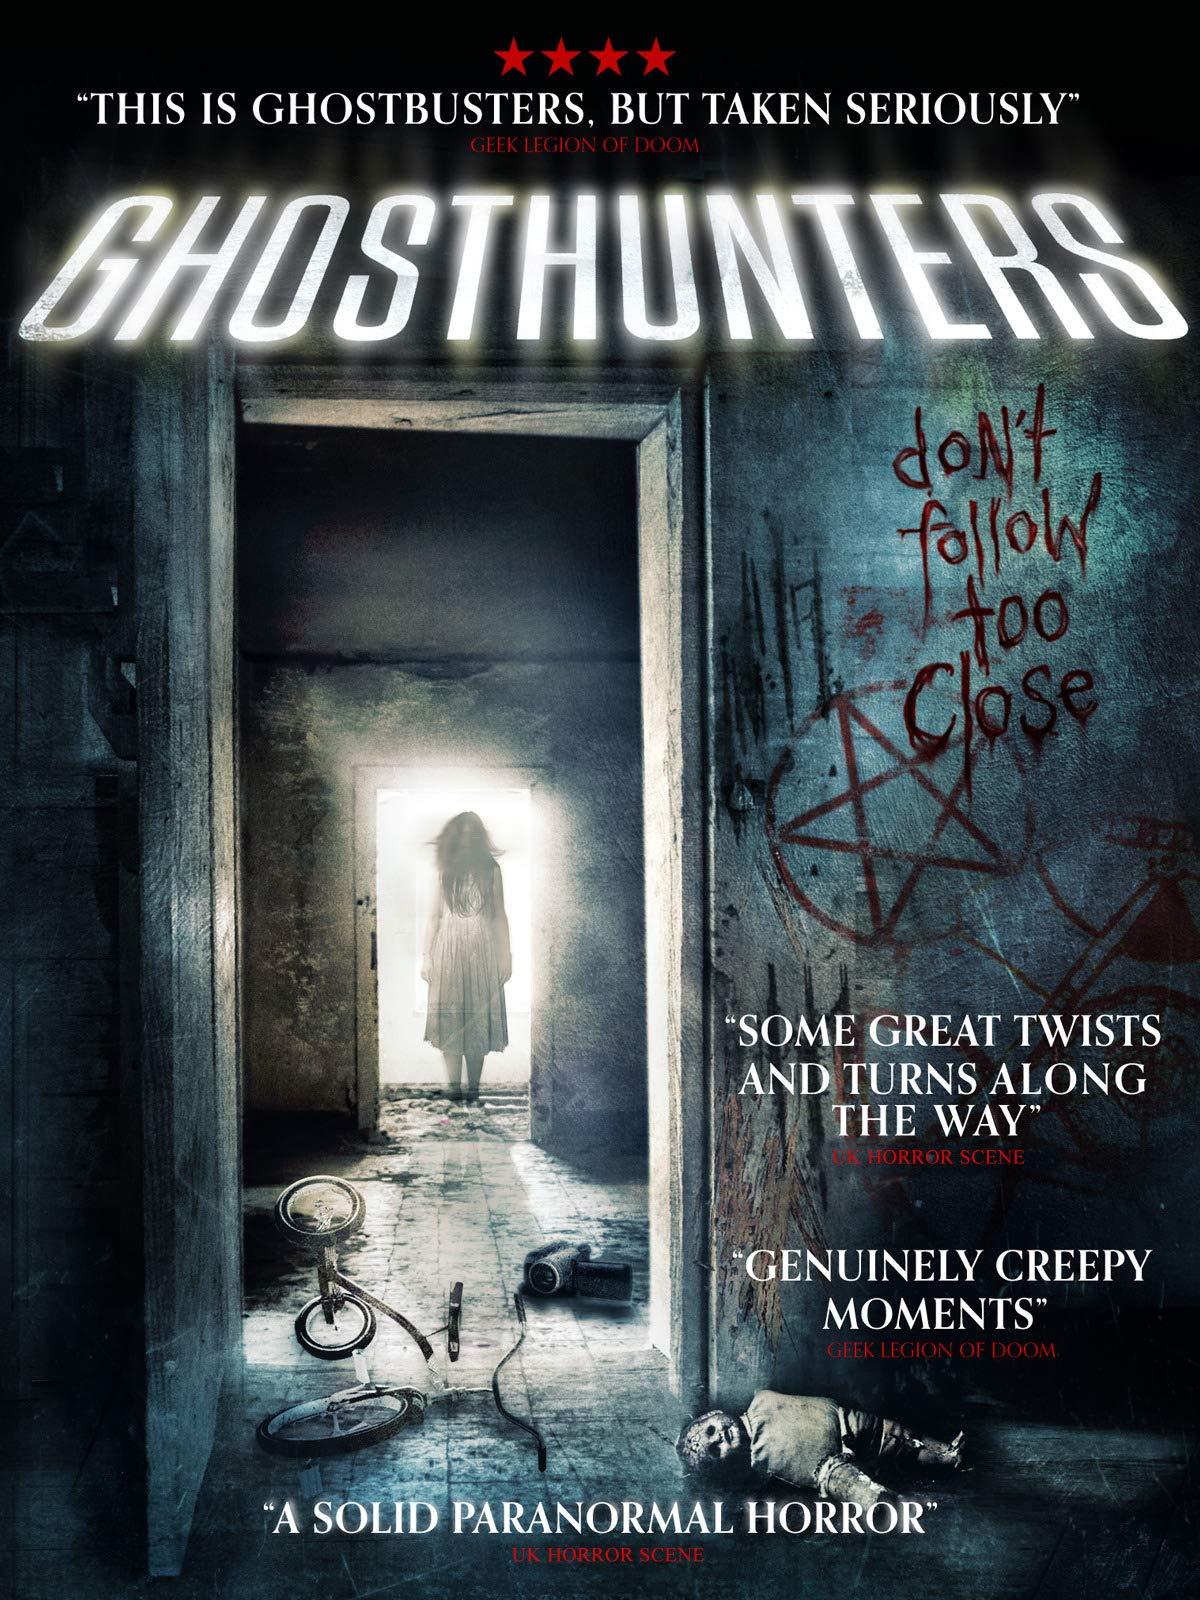 Ghosthunters